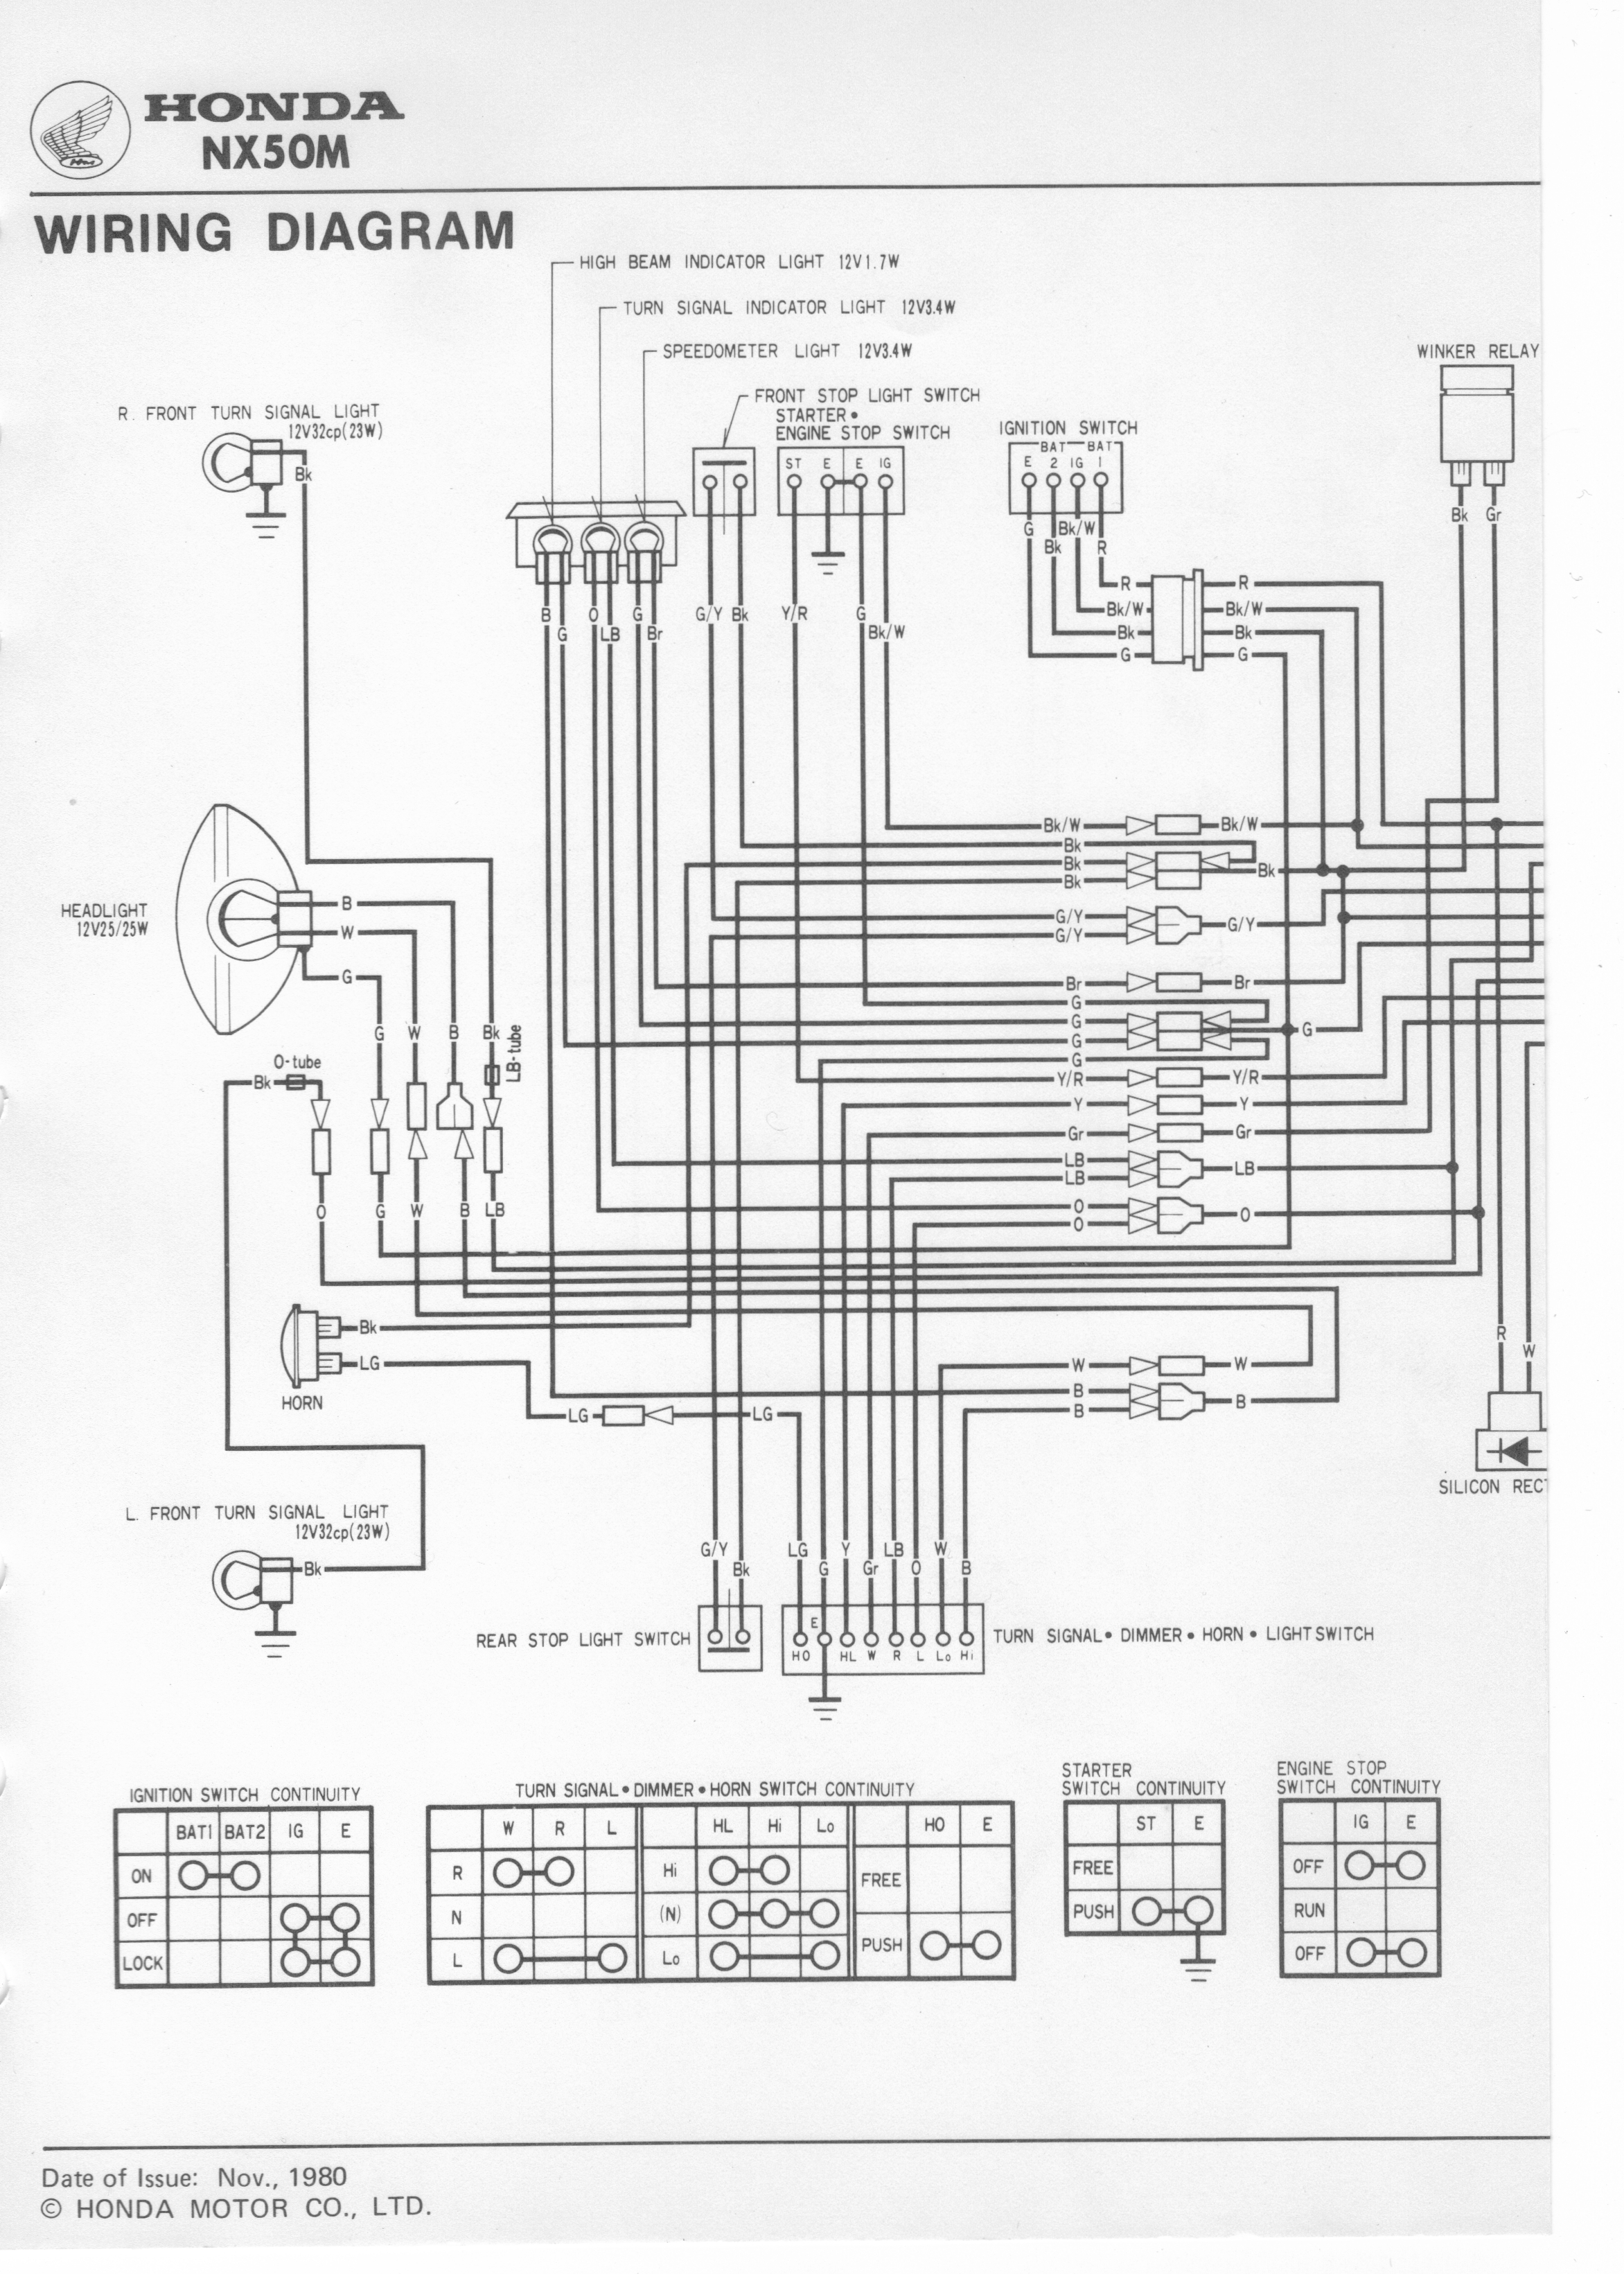 [DIAGRAM] Hc2401he Honda Engine Wiring Diagram FULL